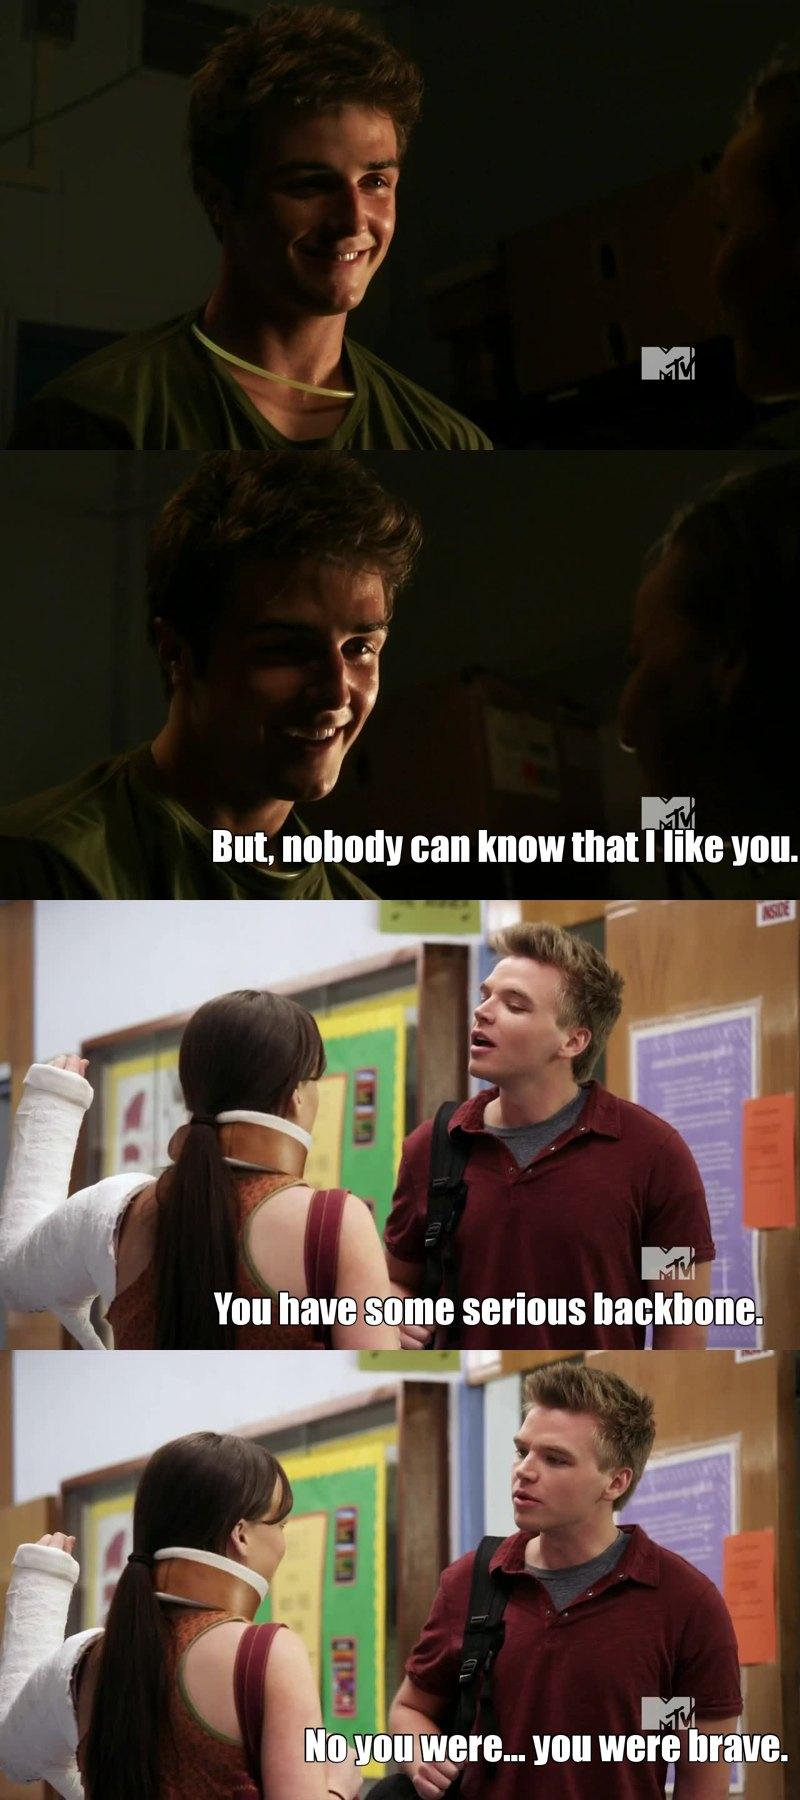 Why does she love Matty? I like Jake...he's sweeter